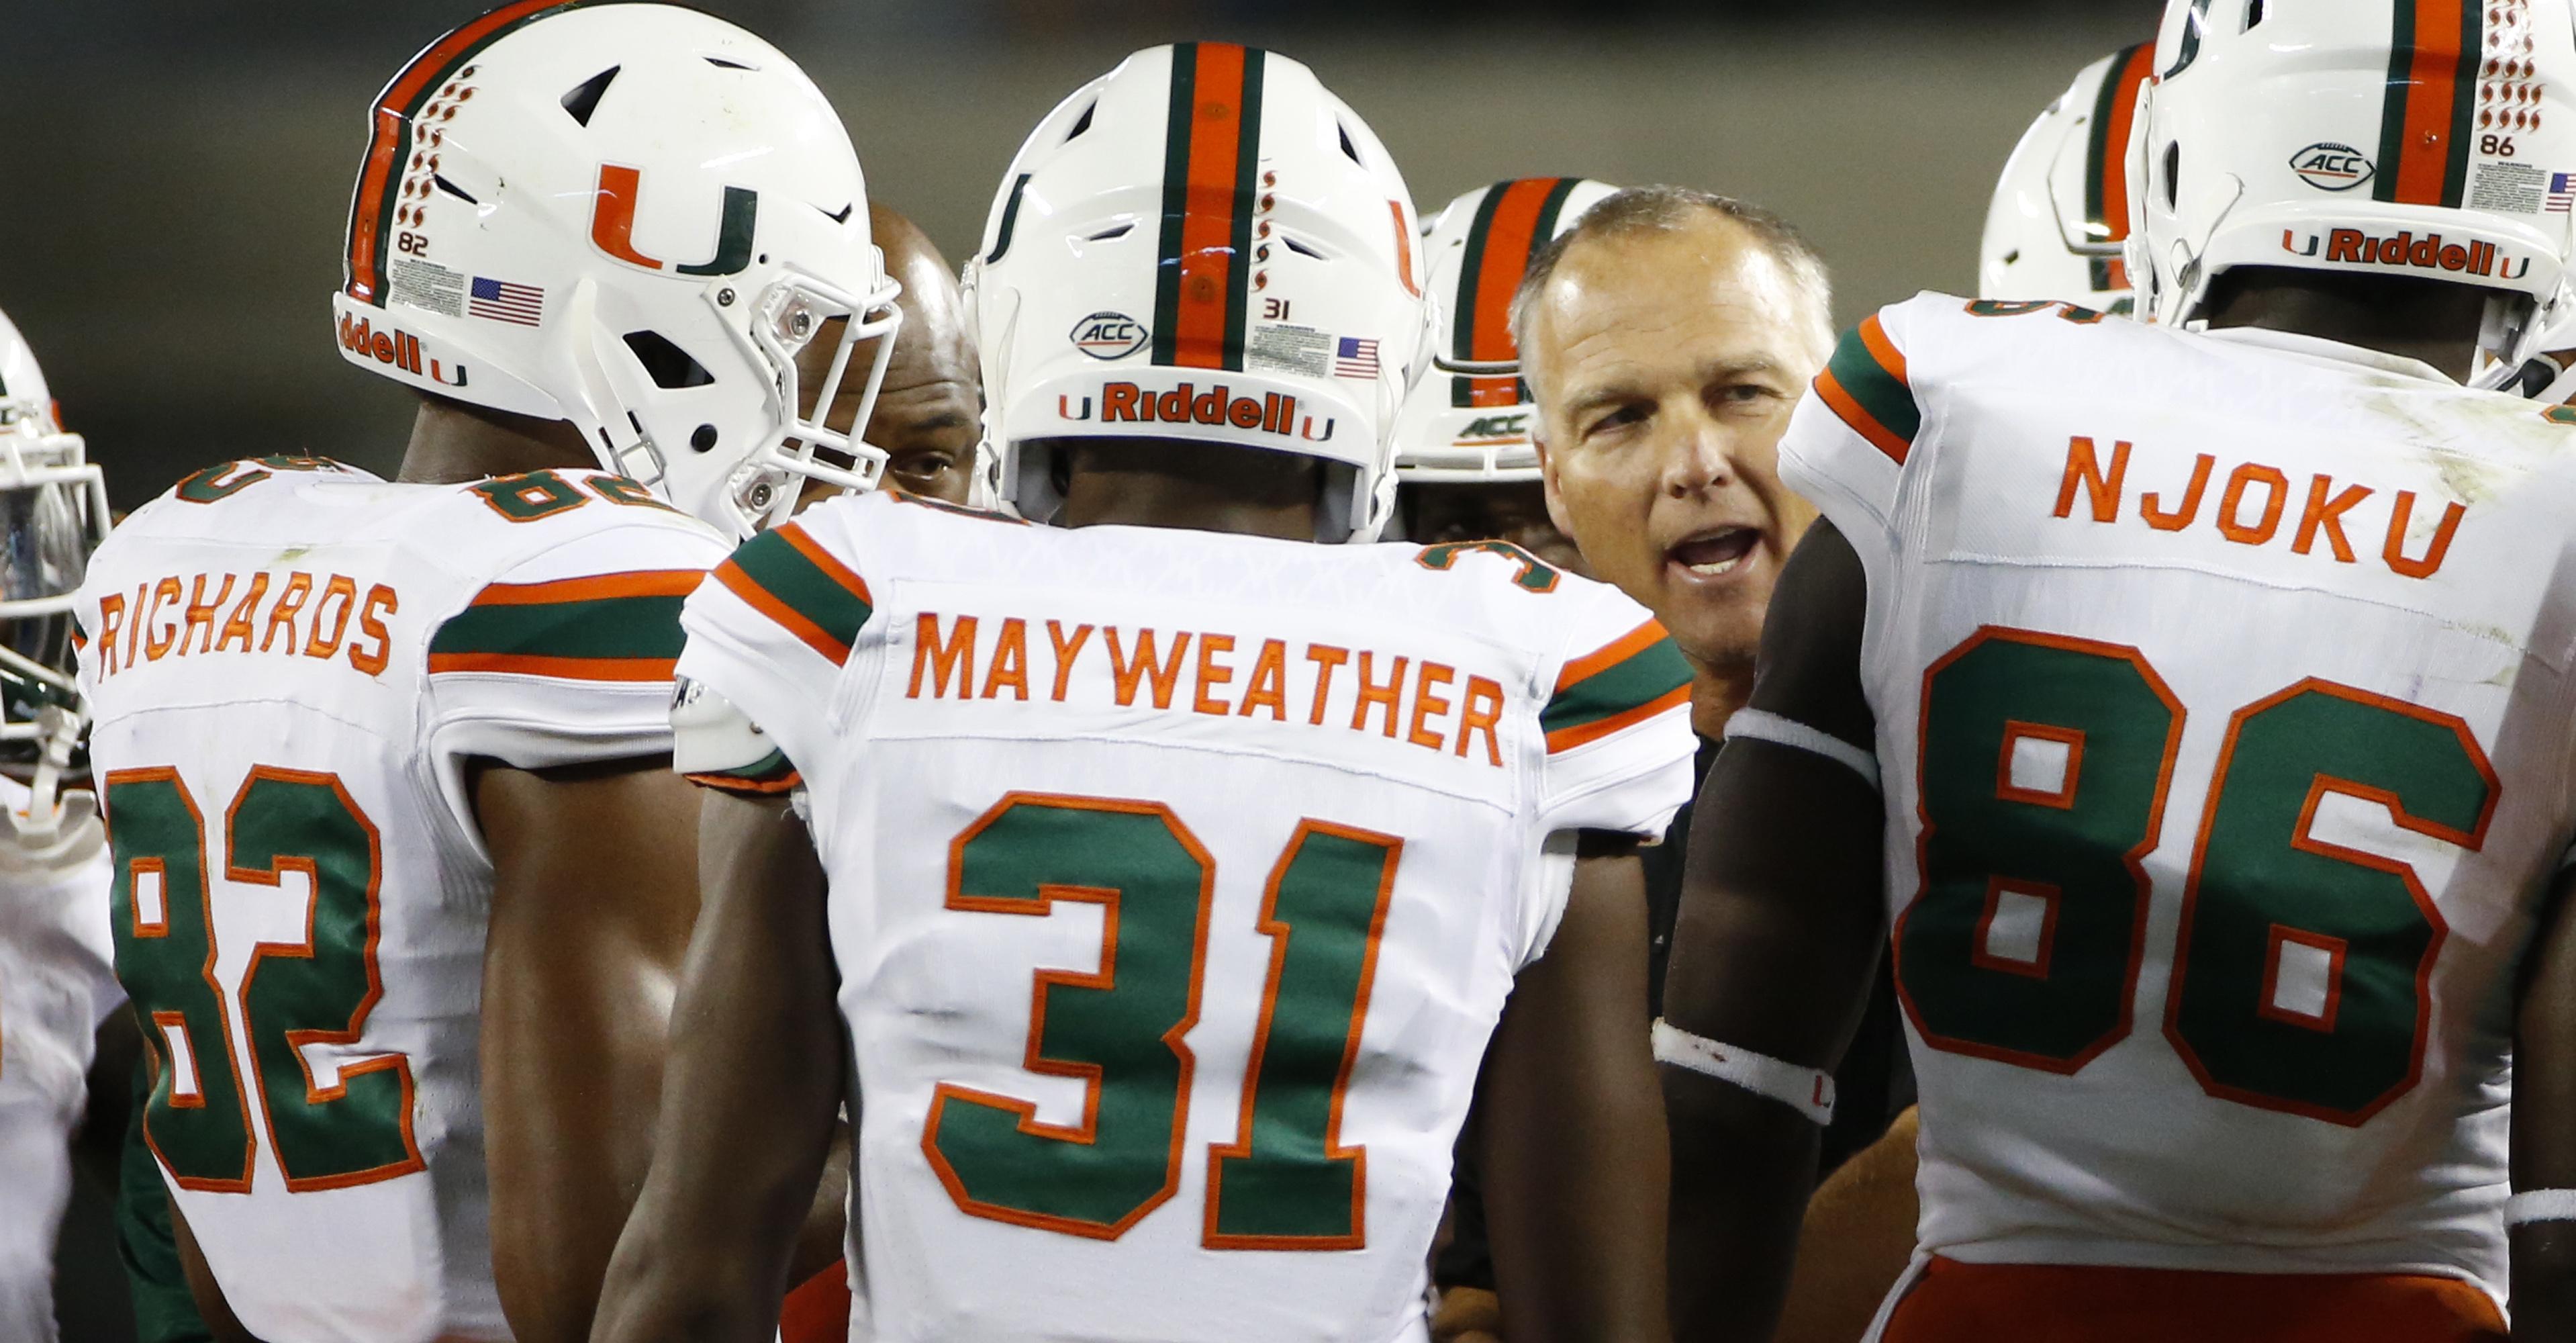 Miami head coach Mark Richt talks to his team during the second half of an NCAA college football game against Virginia Tech at Lane stadium in Blacksburg, Va., Thursday, Oct. 20, 2016. Virginia Tech defeated Miami 37-16. (AP Photo/Steve Helber)